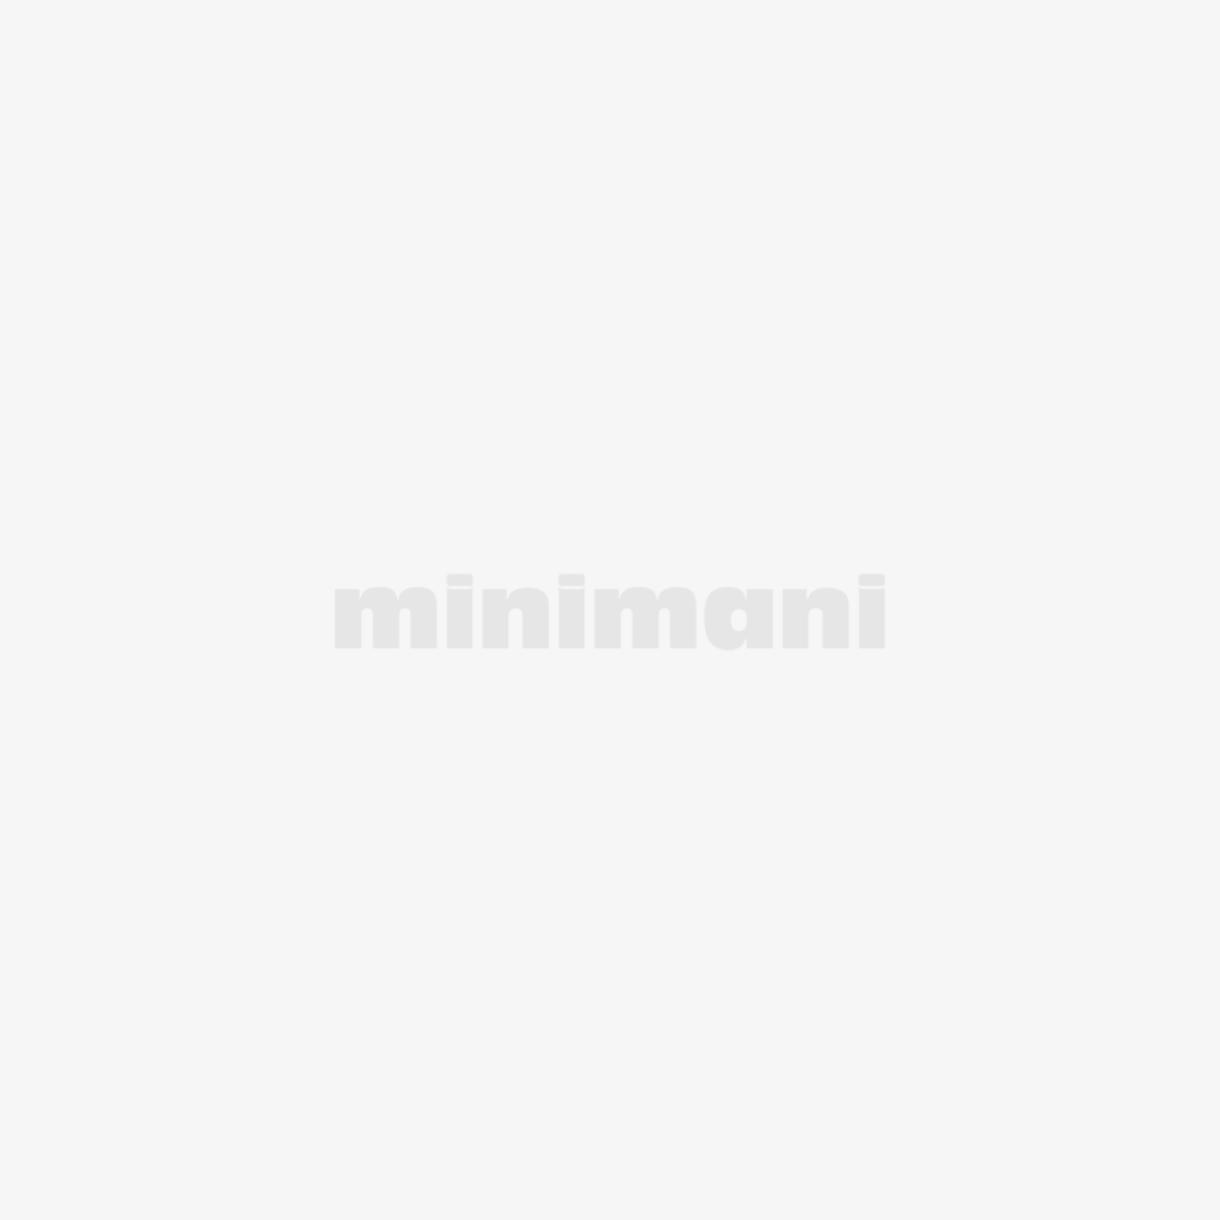 RENTO LAUDELIINA PELLAVAFROTEE 50X60CM MUSTA-PELLAVA